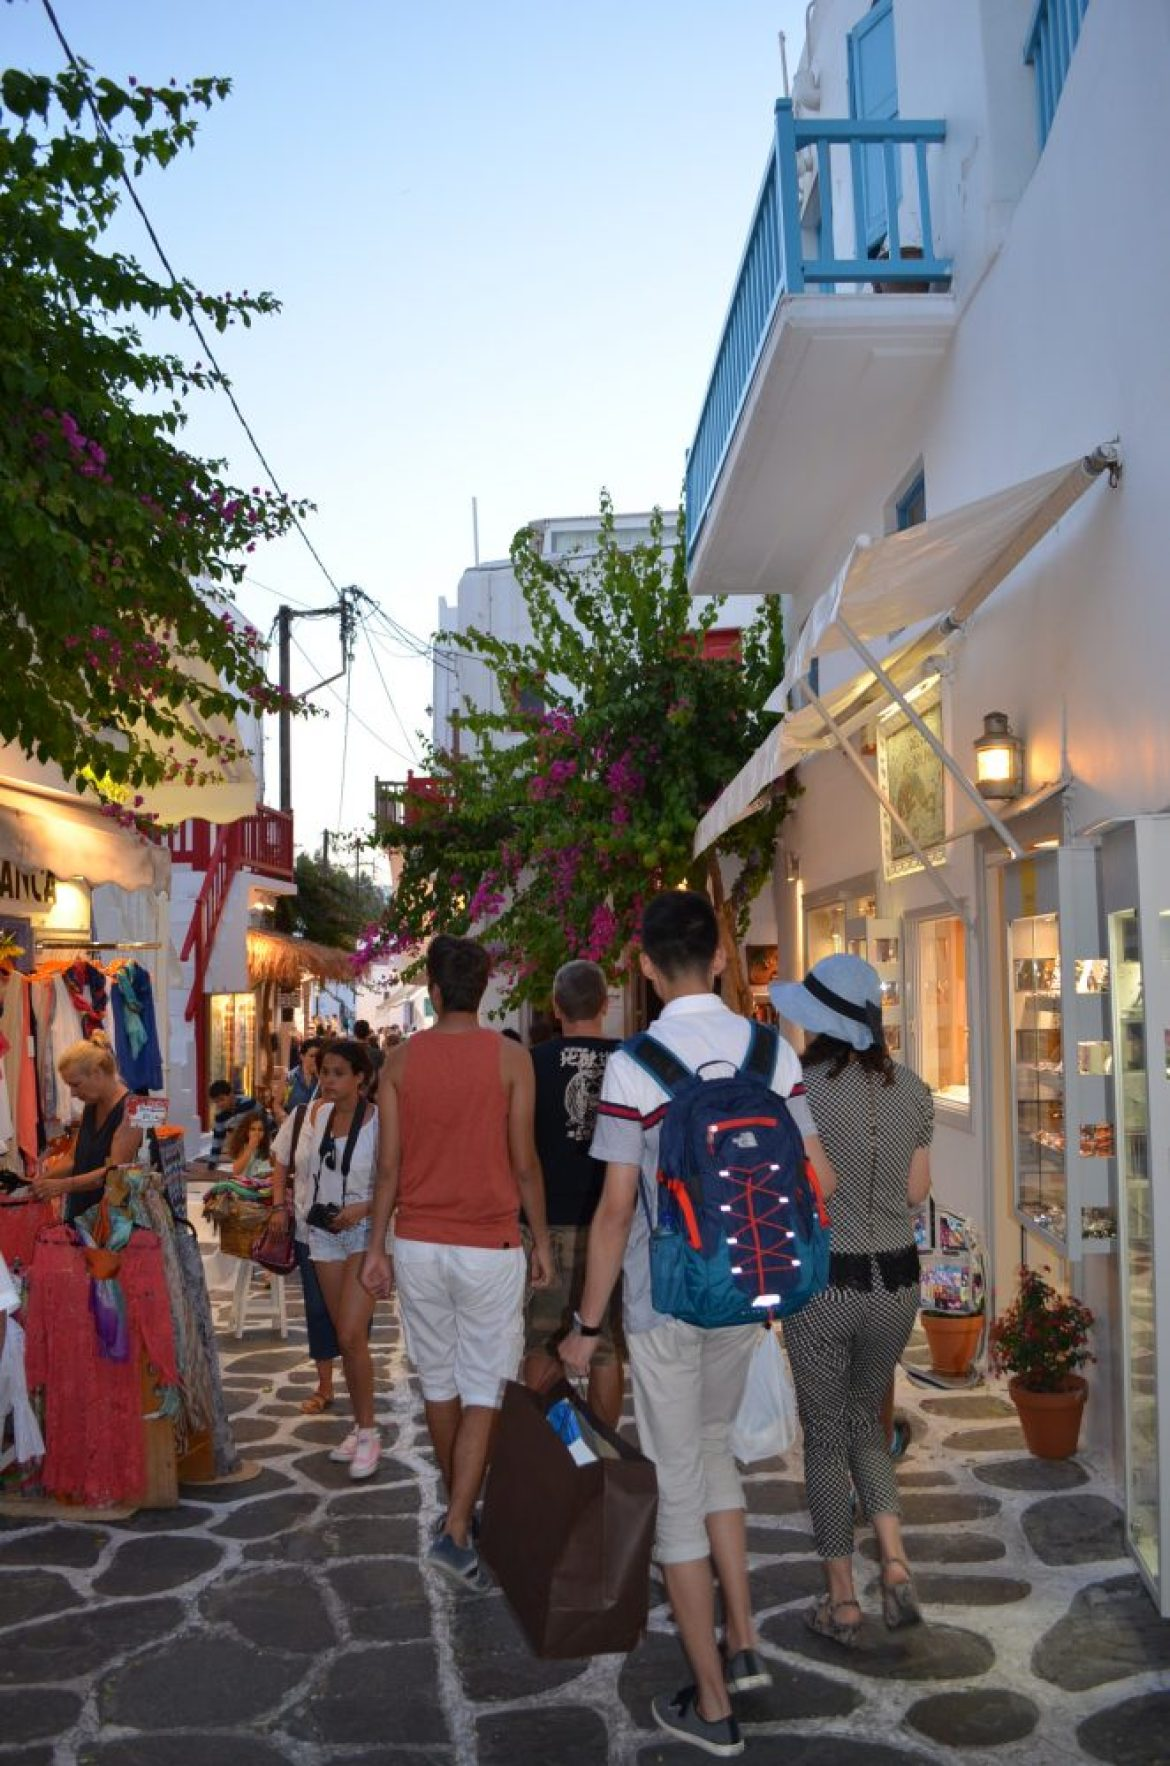 Matogianni-shopping-street-Mykonos